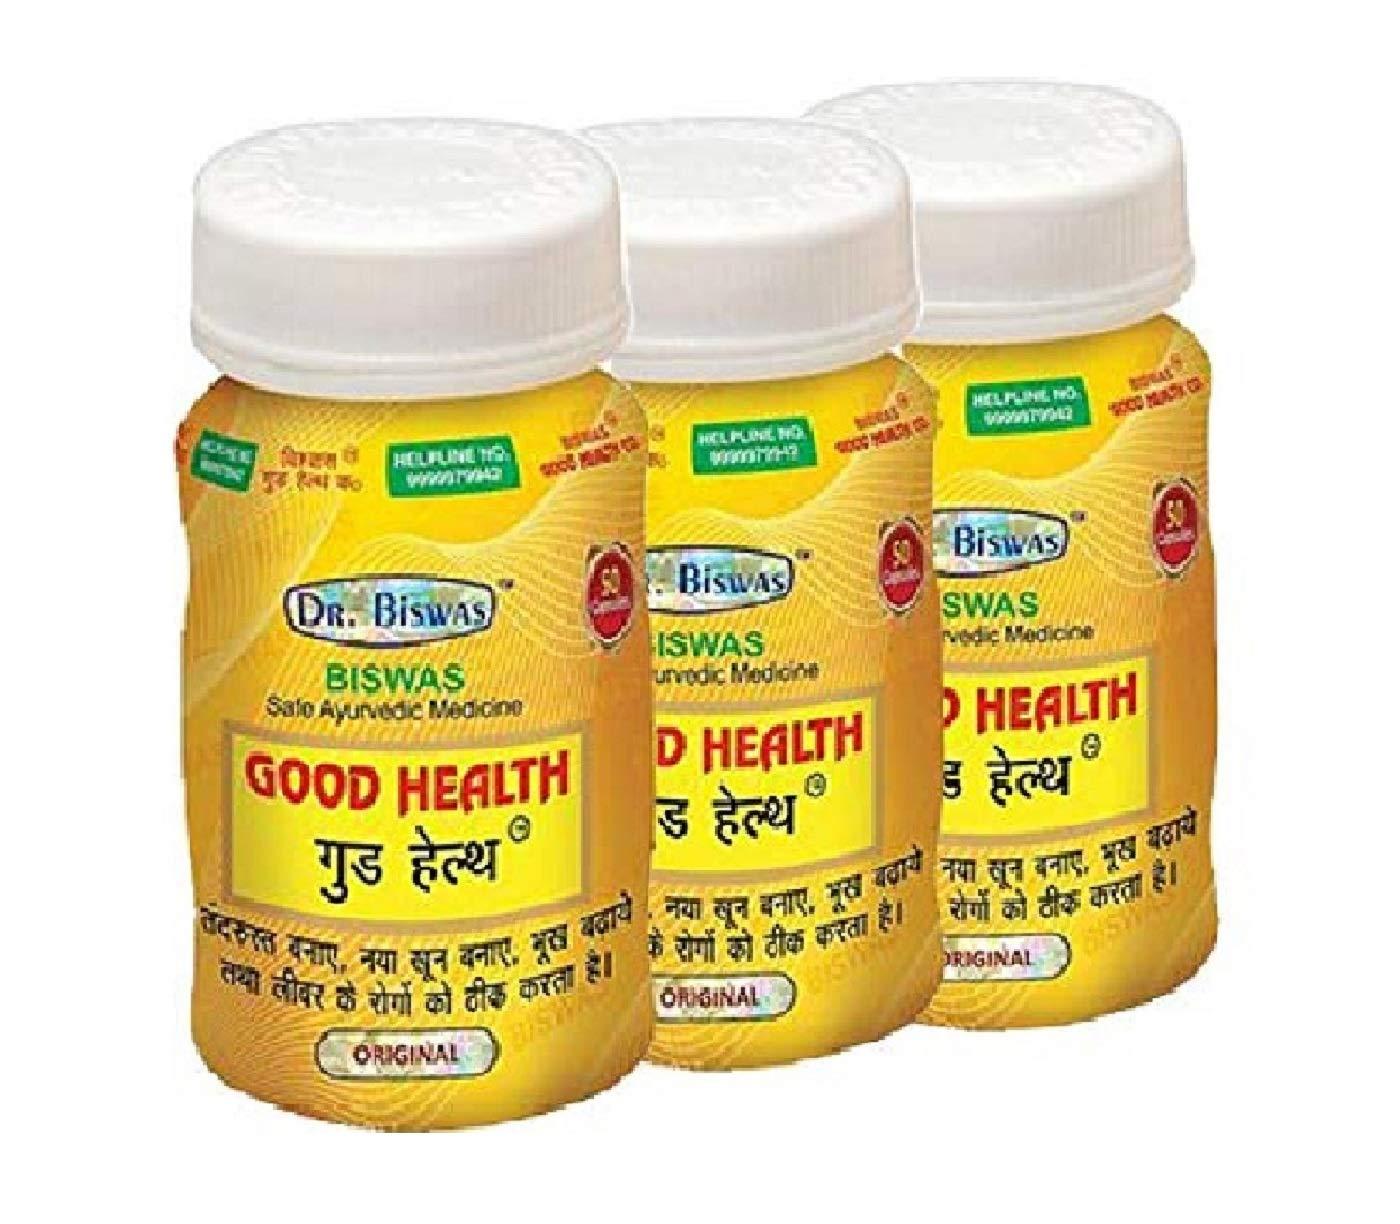 Dr. Biswas Ayurvedic Good Health - 50 Capsules, Pack of 3